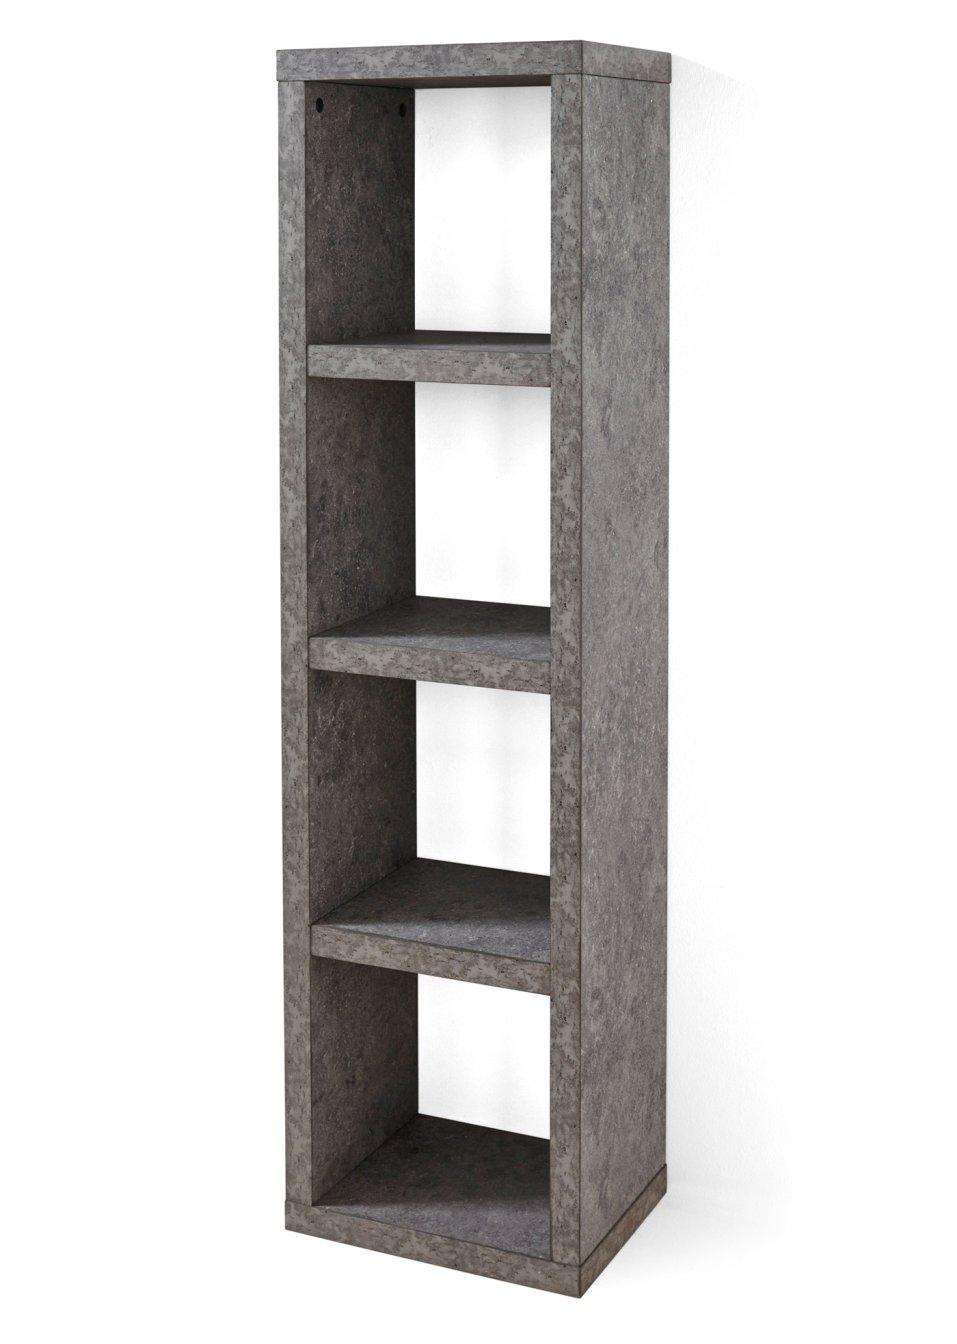 allesk nner in w rfelform regal kenia 4 f cher beton mit 4 f chern. Black Bedroom Furniture Sets. Home Design Ideas